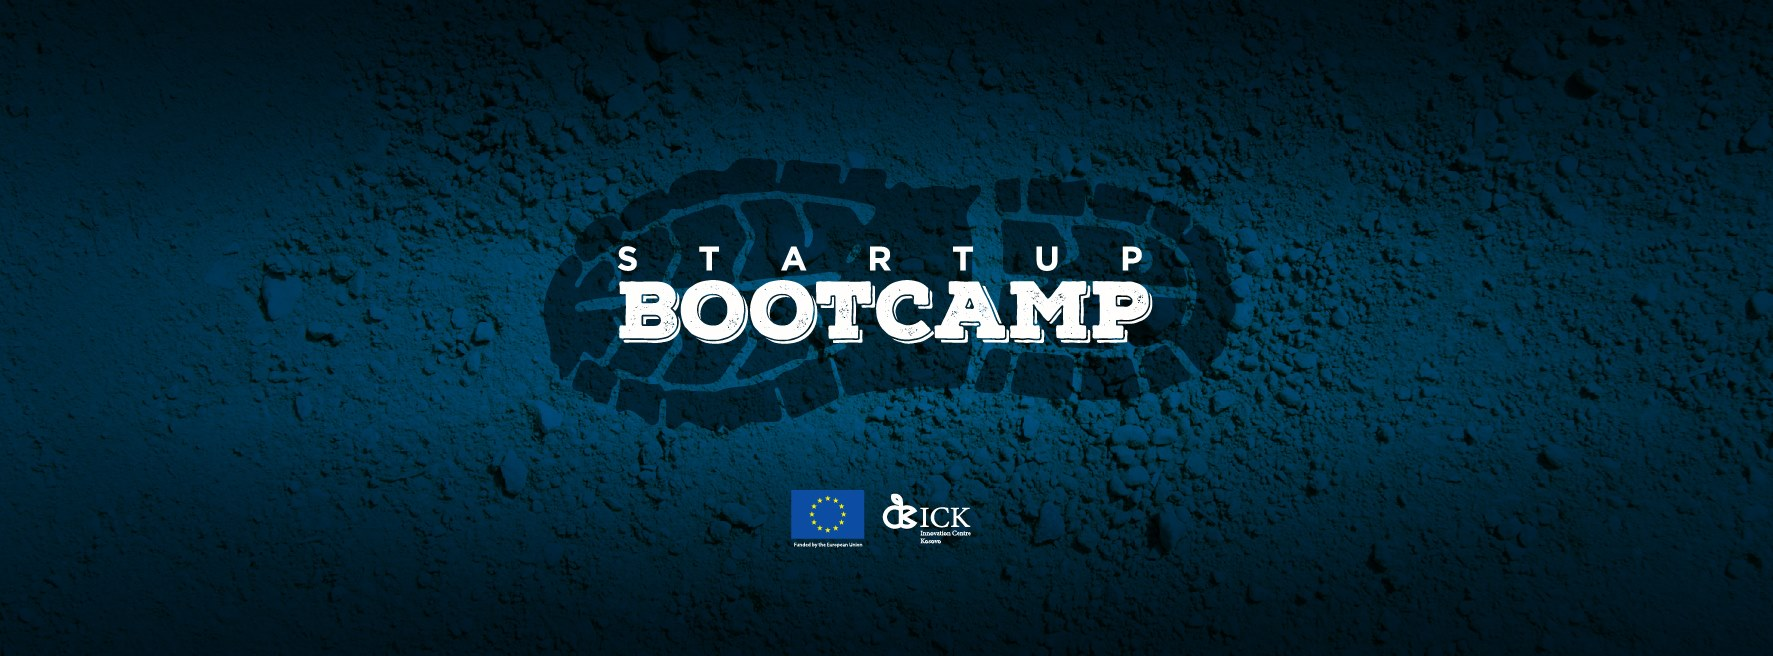 Startup Bootcamp #2